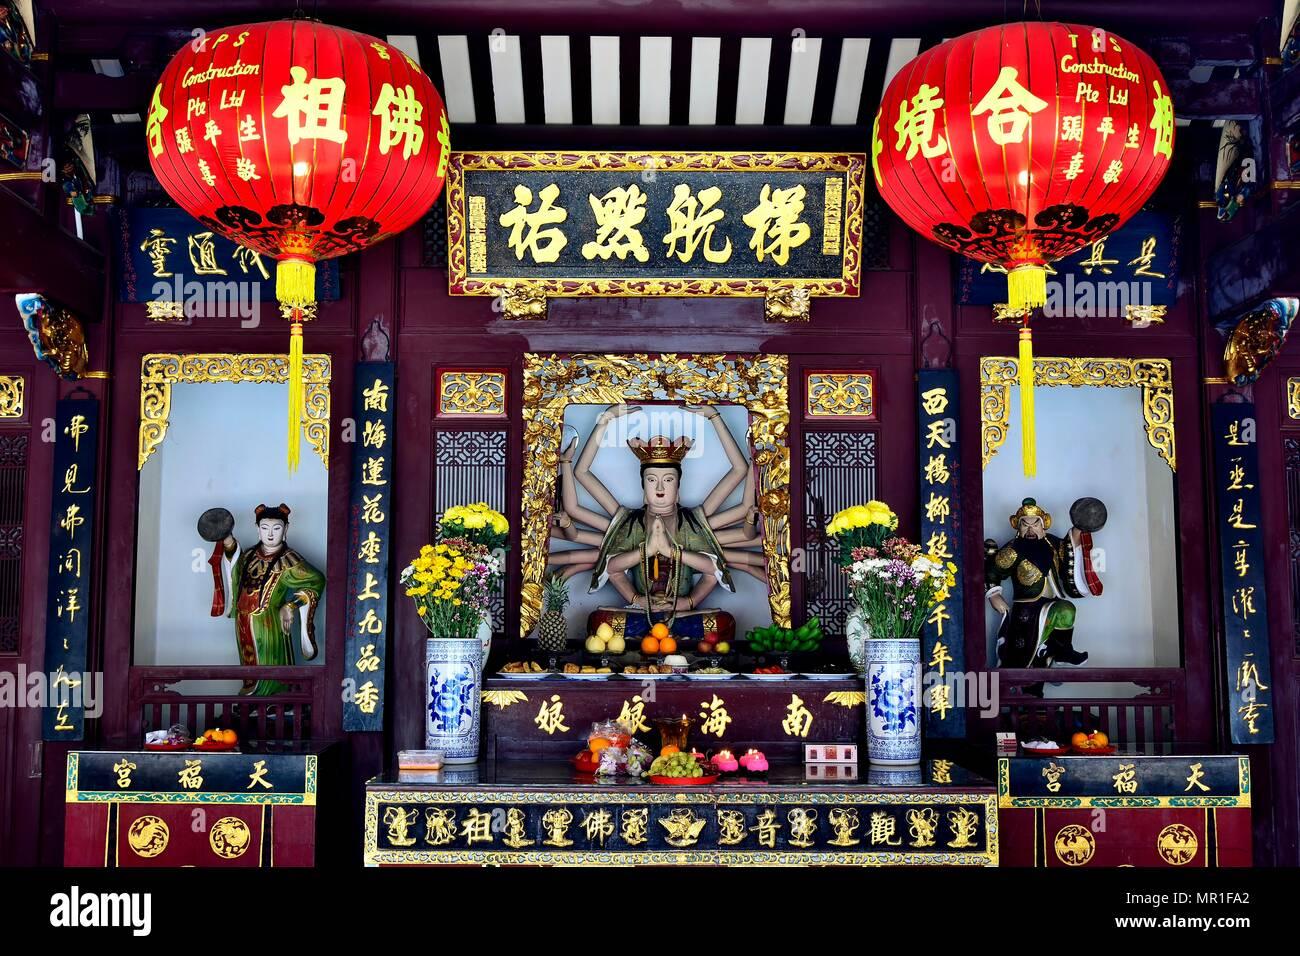 Singapore - May 15th 2018: Chinese Buddhist Taoist shrine decorated for Vesak Day to honour Buddha in Historic Telok Ayer, Singapore - Stock Image